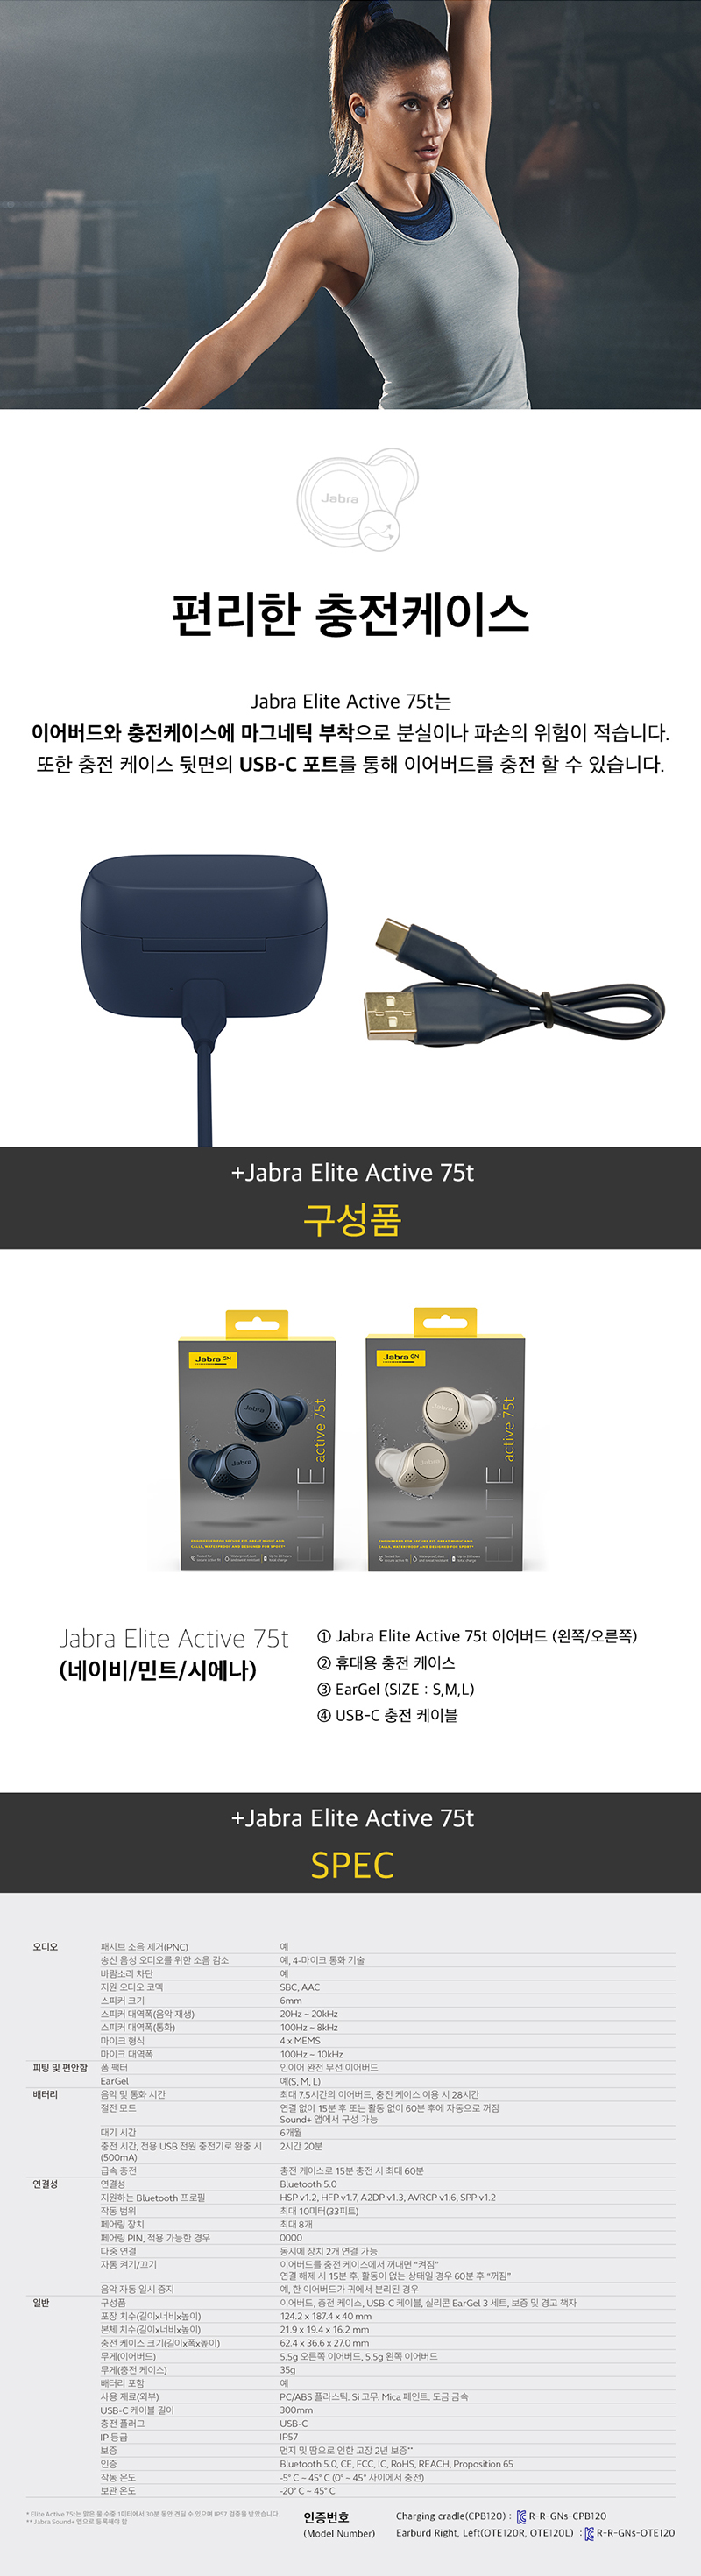 Elite-Active-75T-detail_색상보정_09.jpg